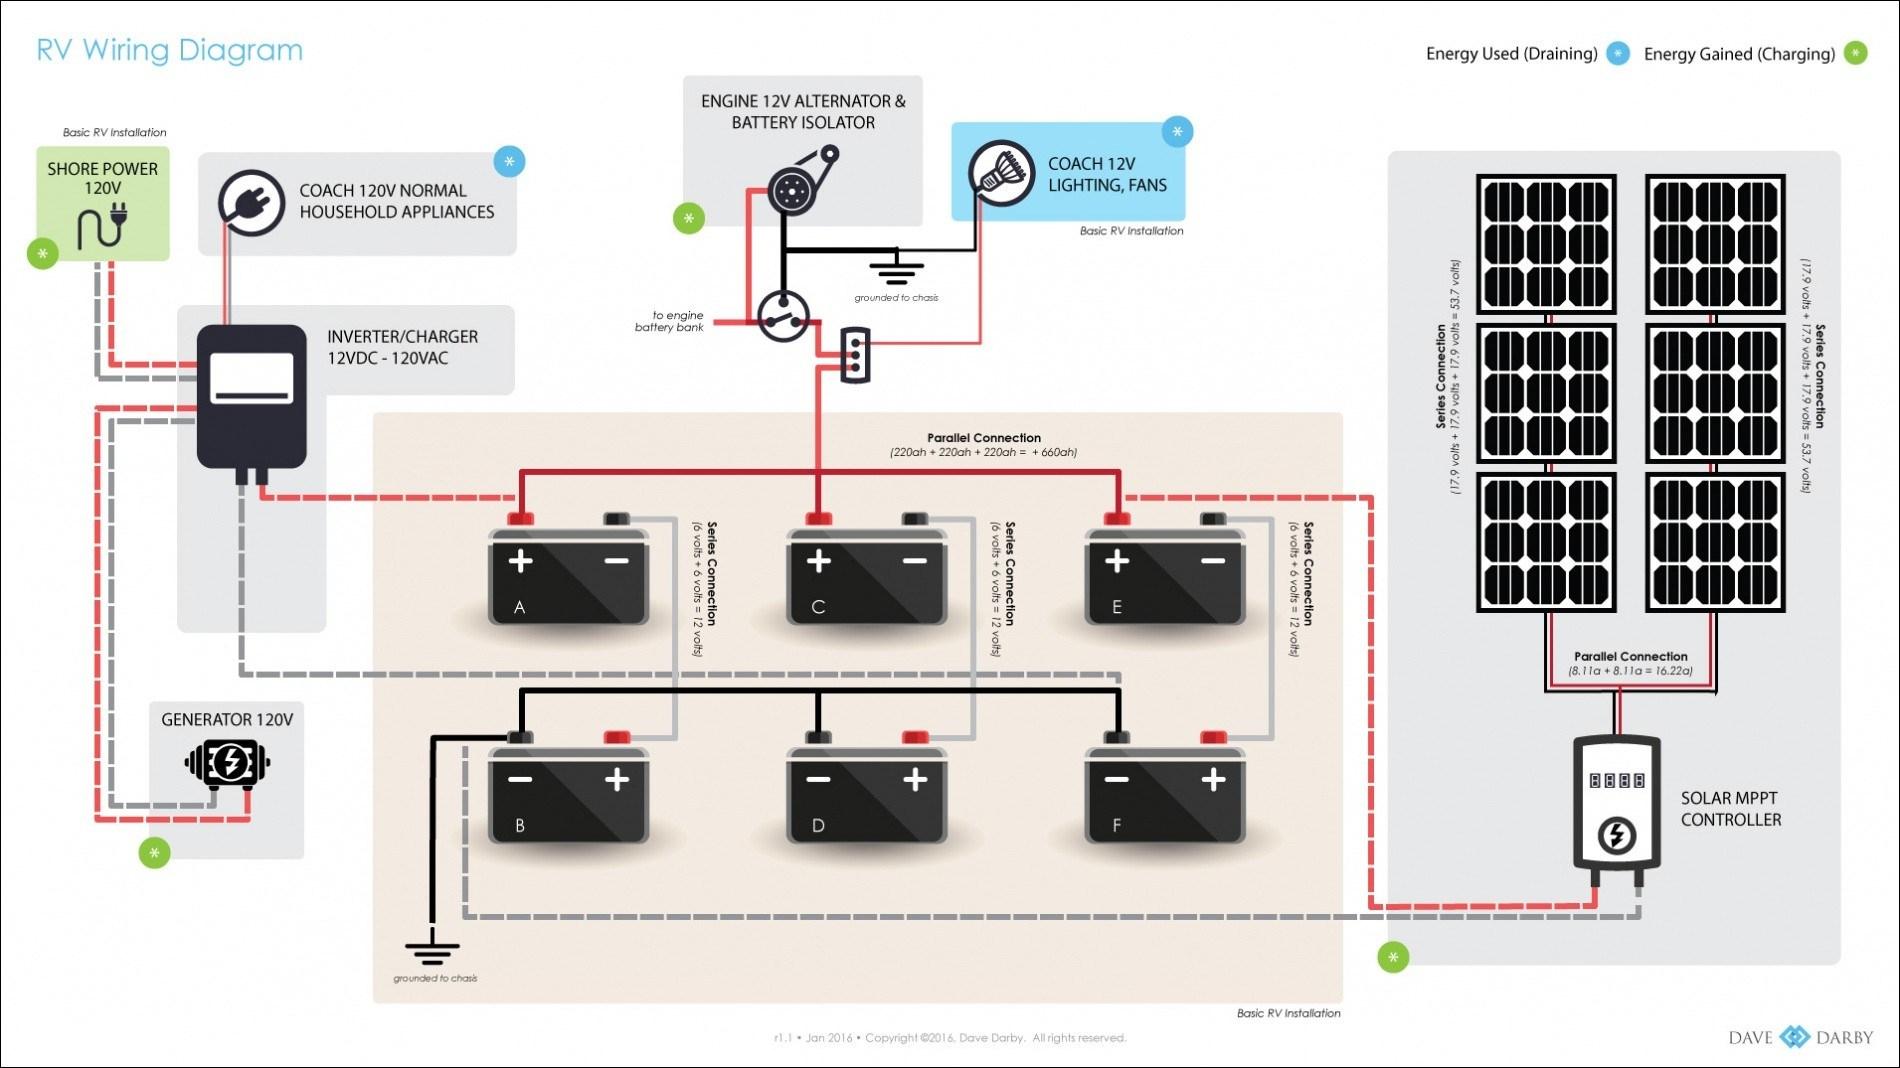 Diagram Solar Wire Diagram File Yy87134 - Rv Solar Wiring Diagram